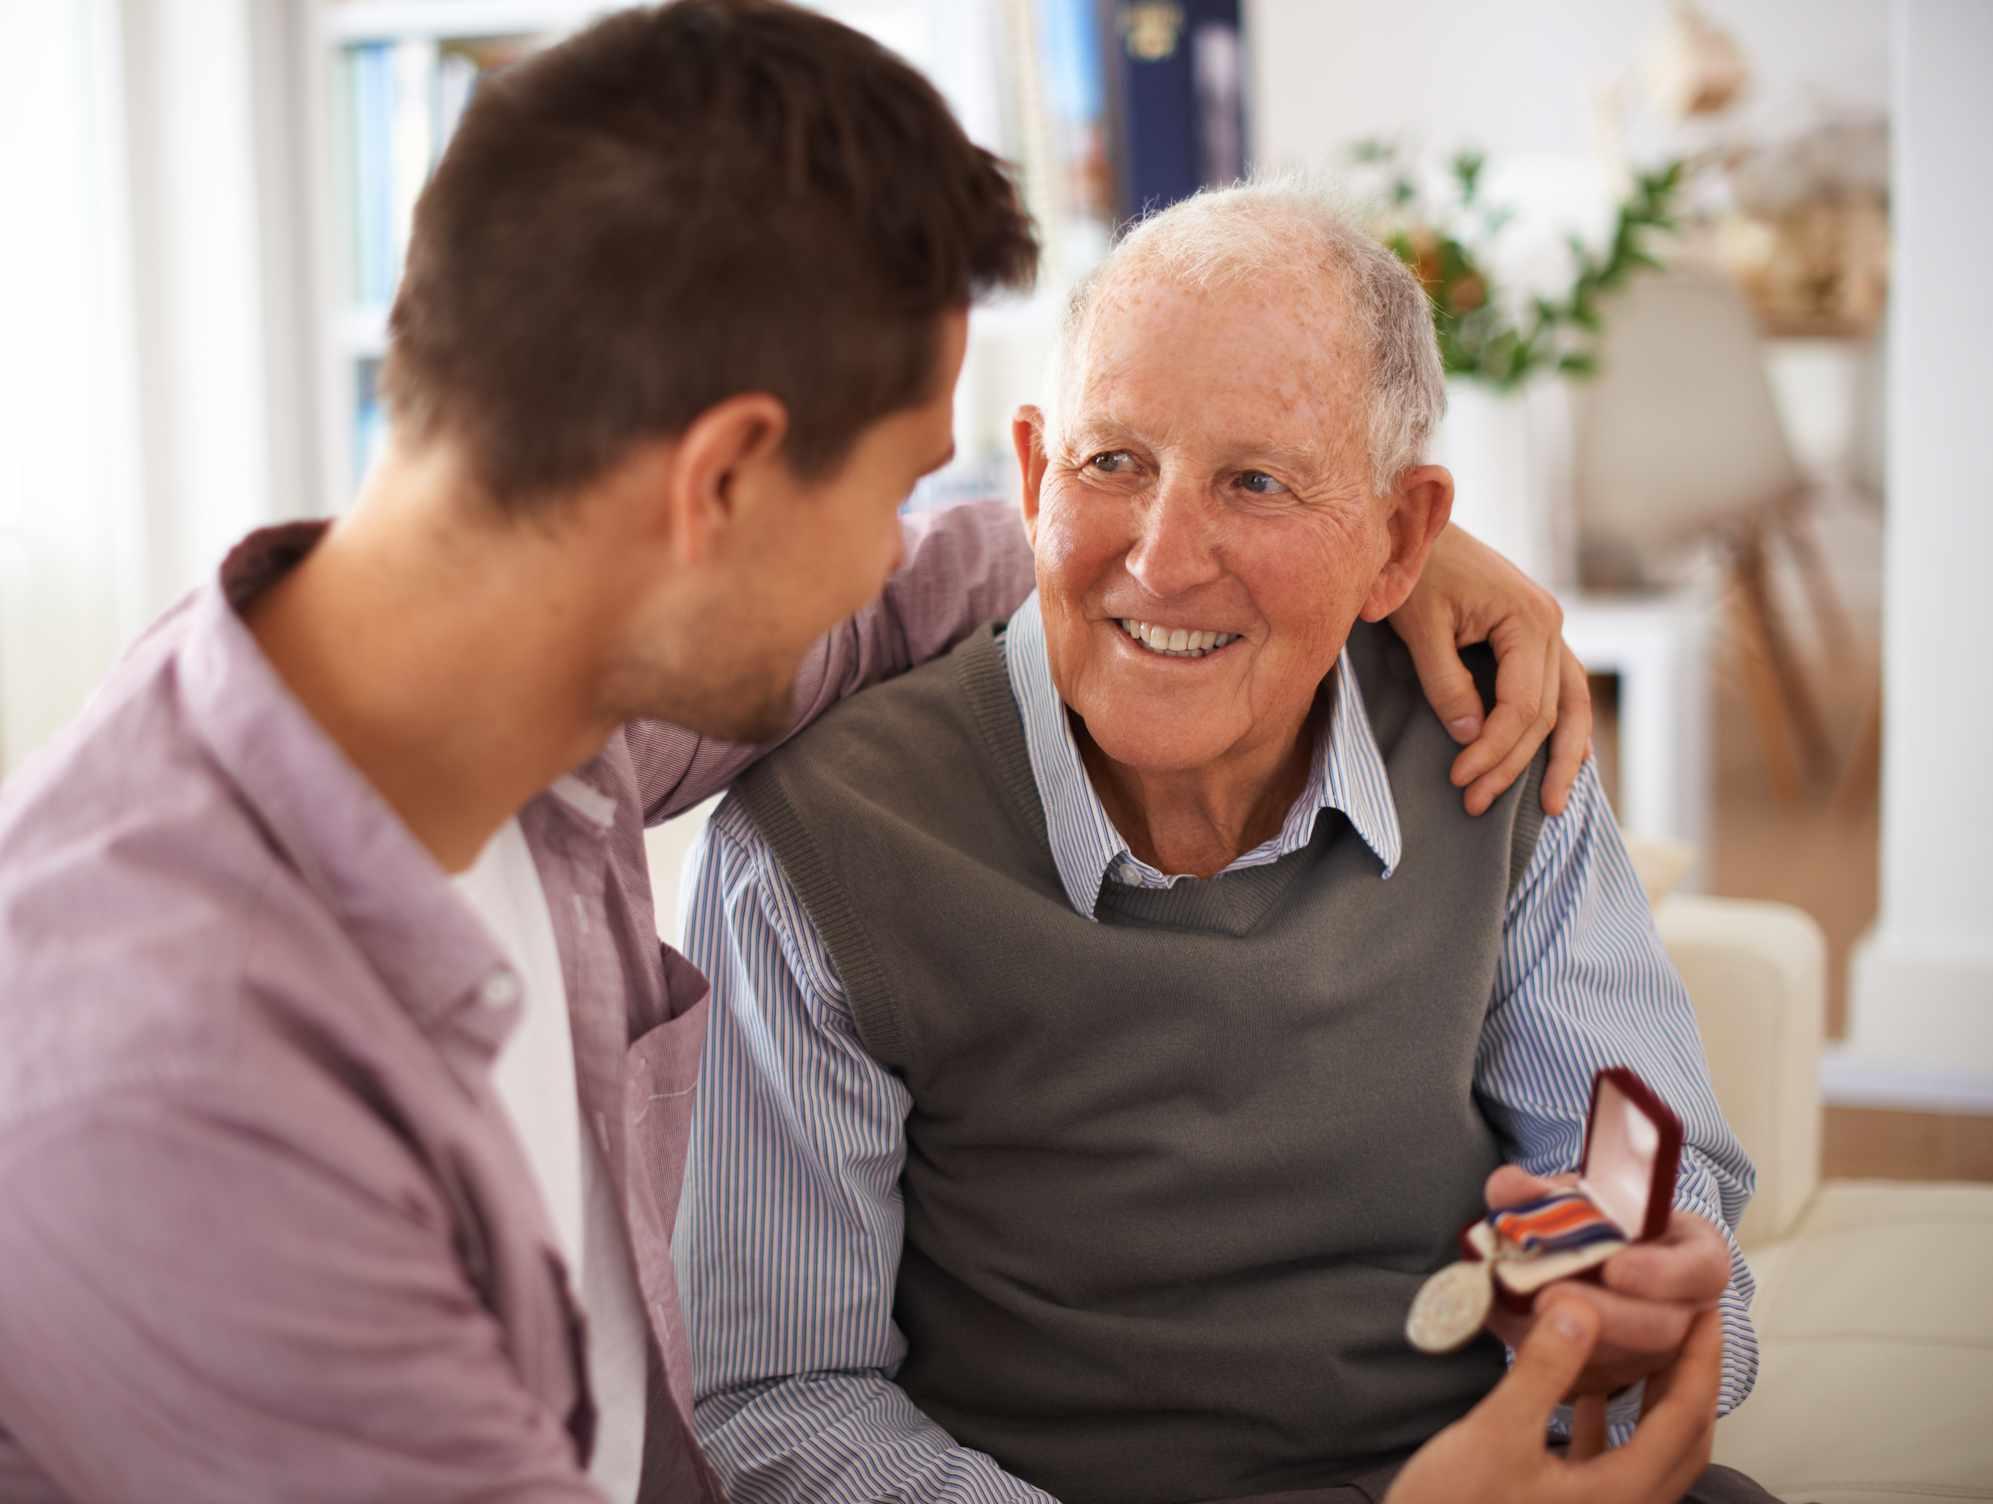 An older man showing his grandson a medal